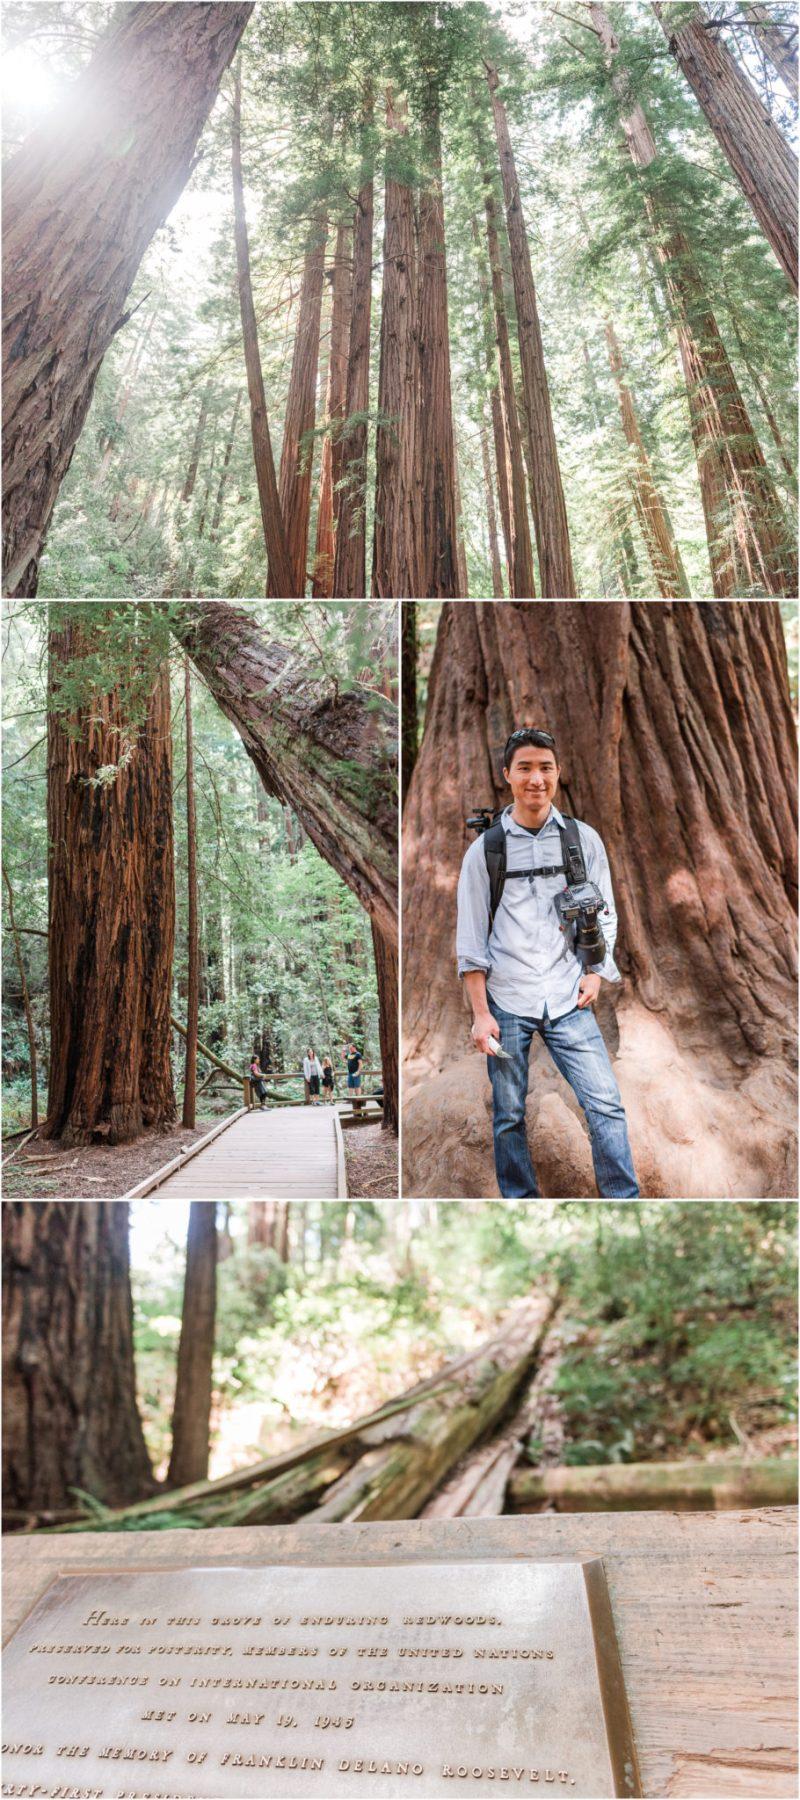 Muir Woods Redwoods National Park California